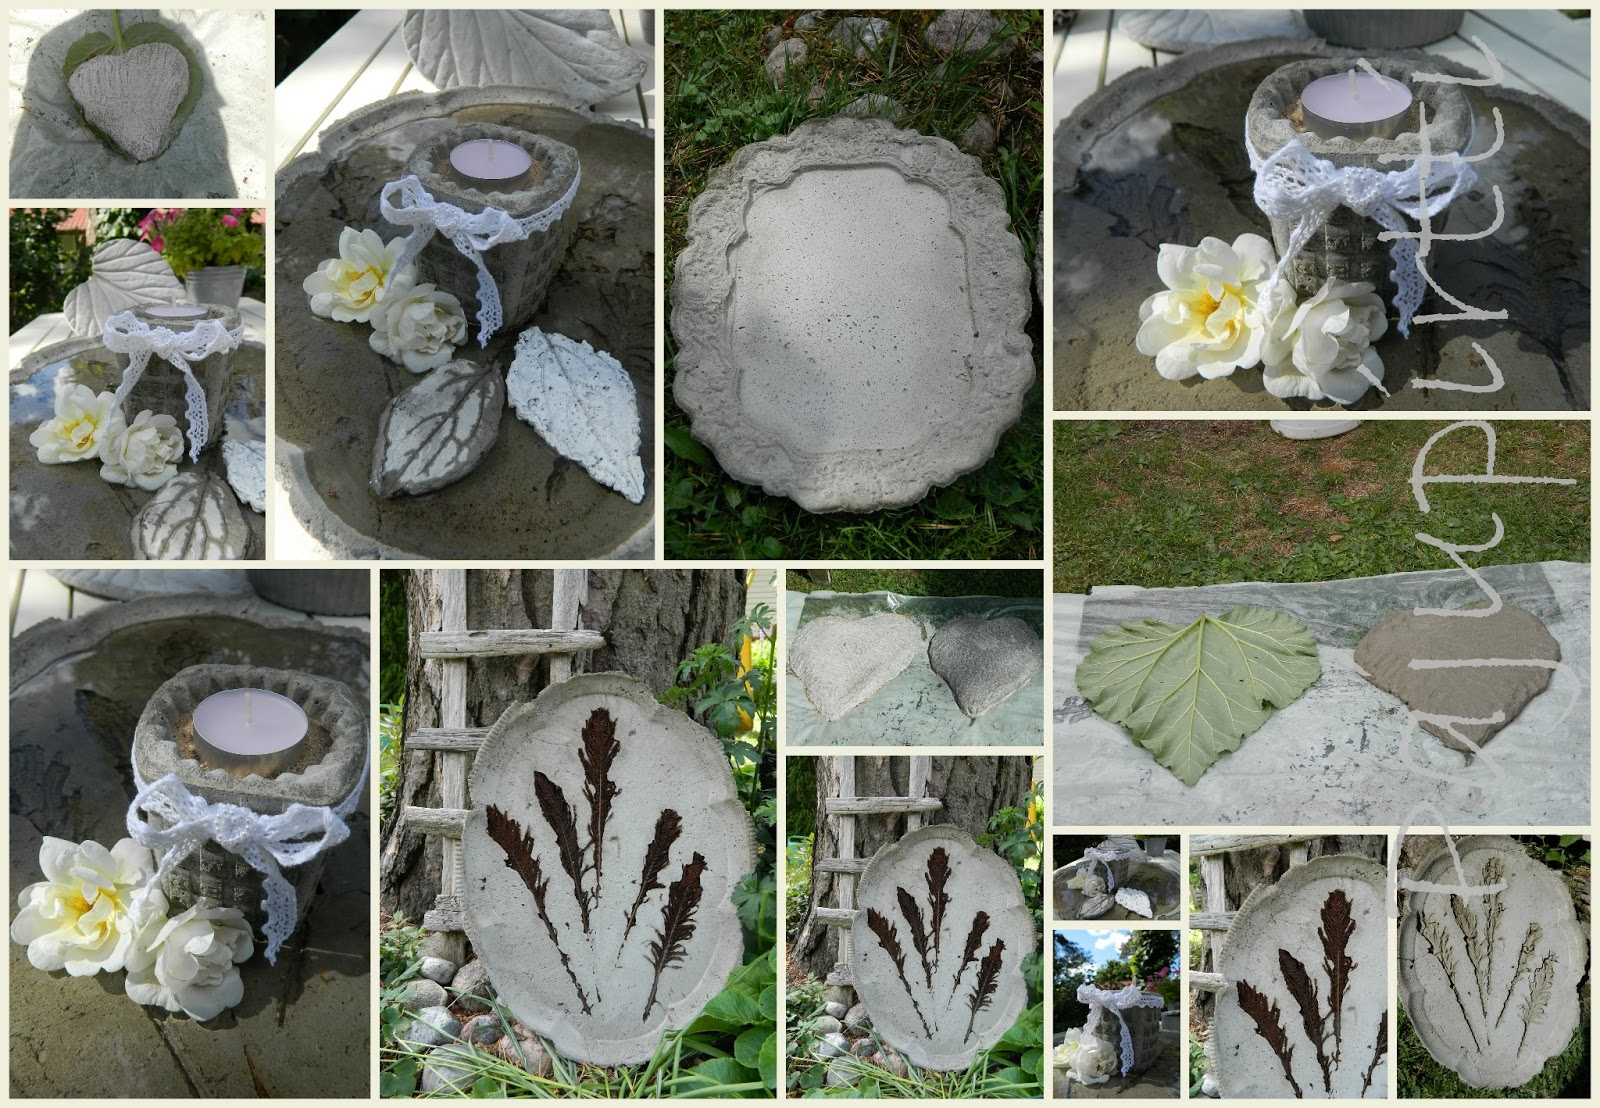 Luomuksia betonista savesta